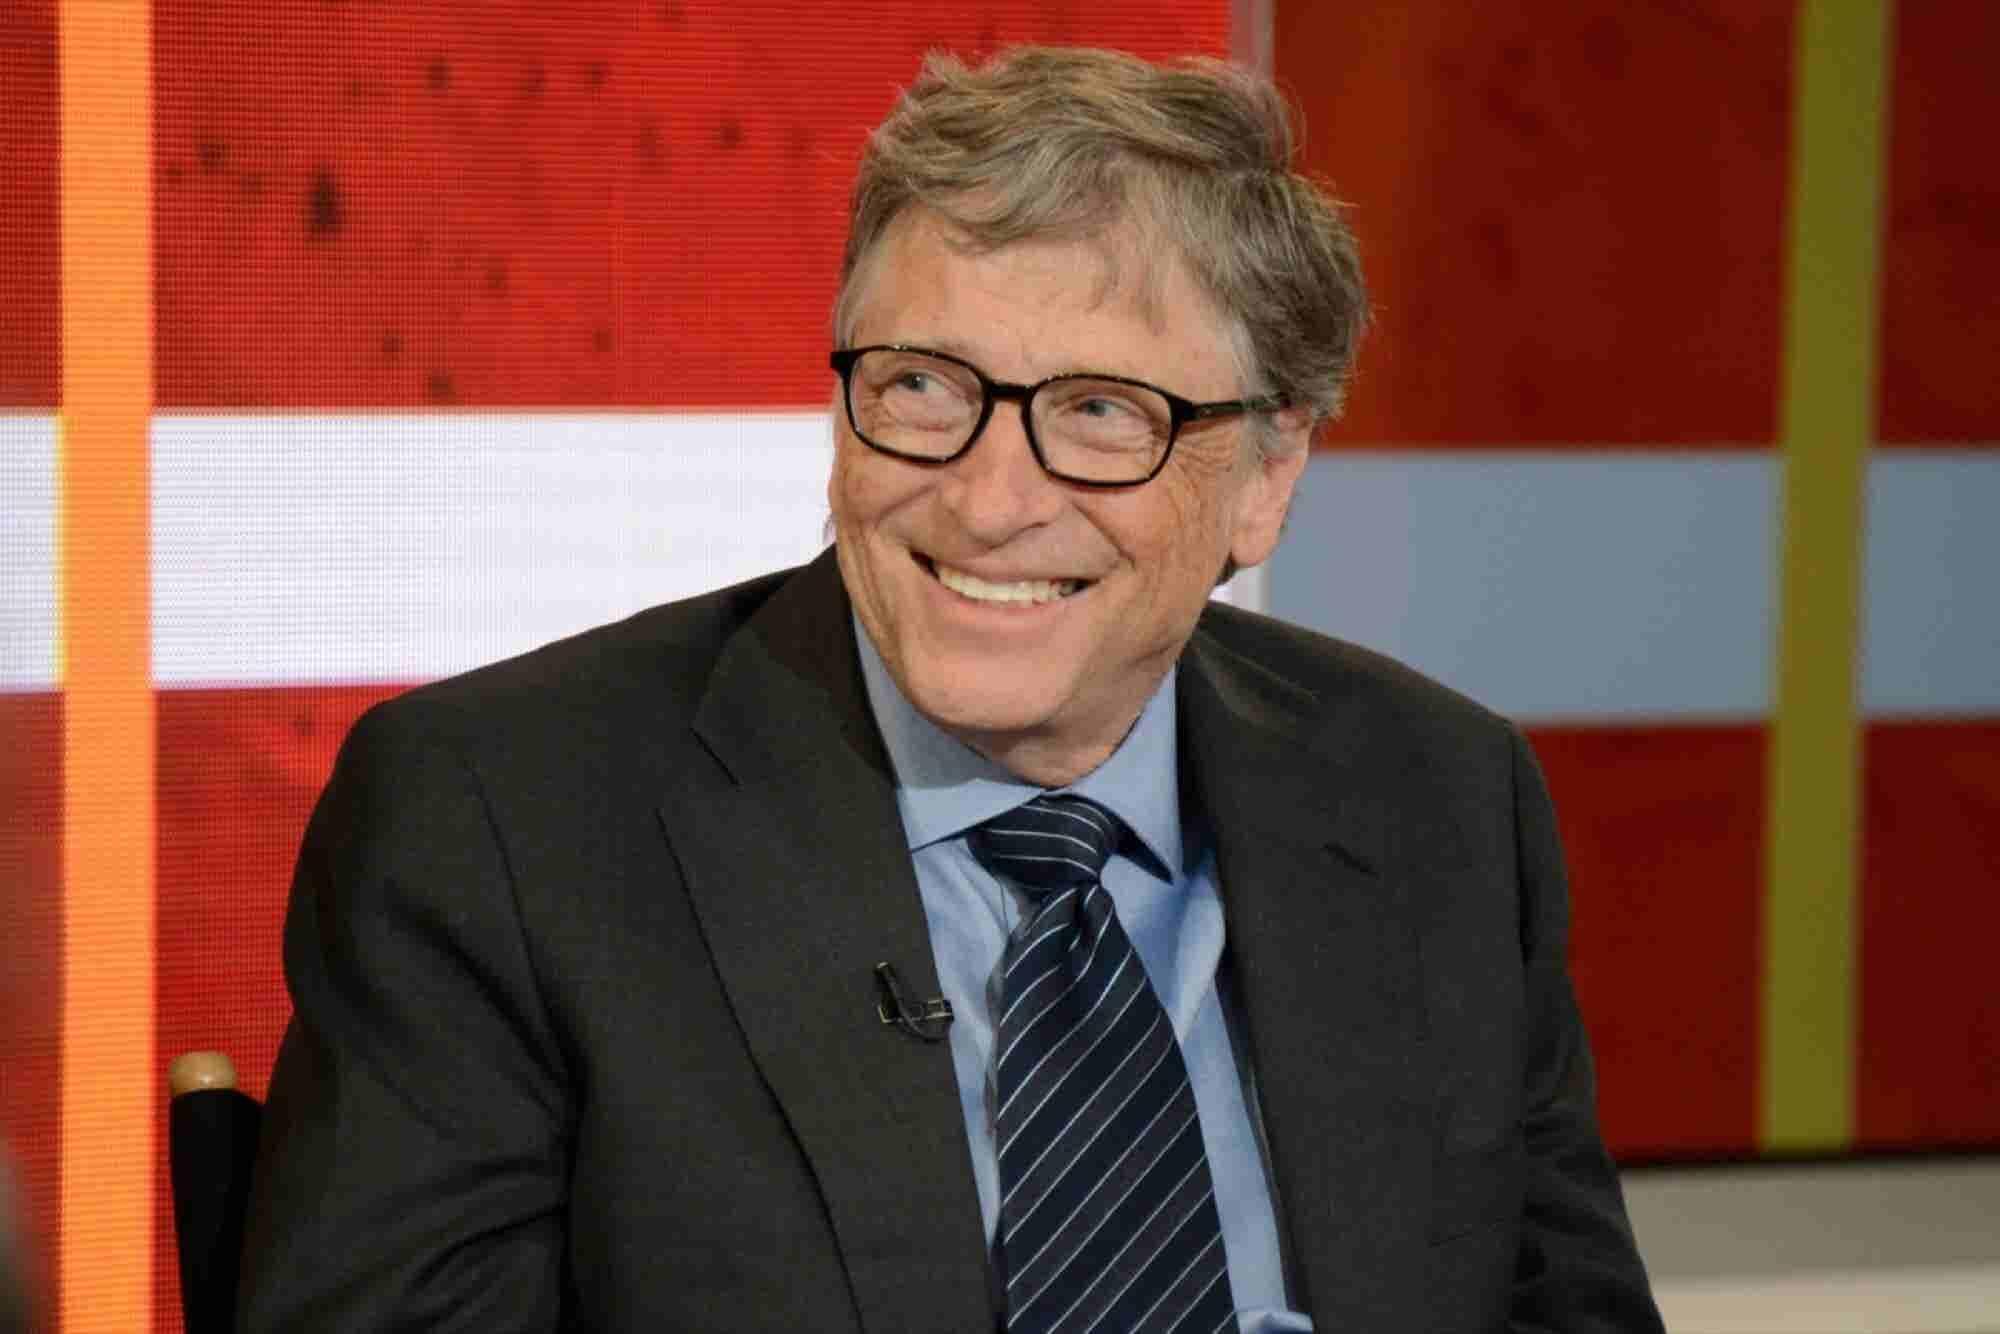 Bill Gates's 5 Favorite Books of 2016